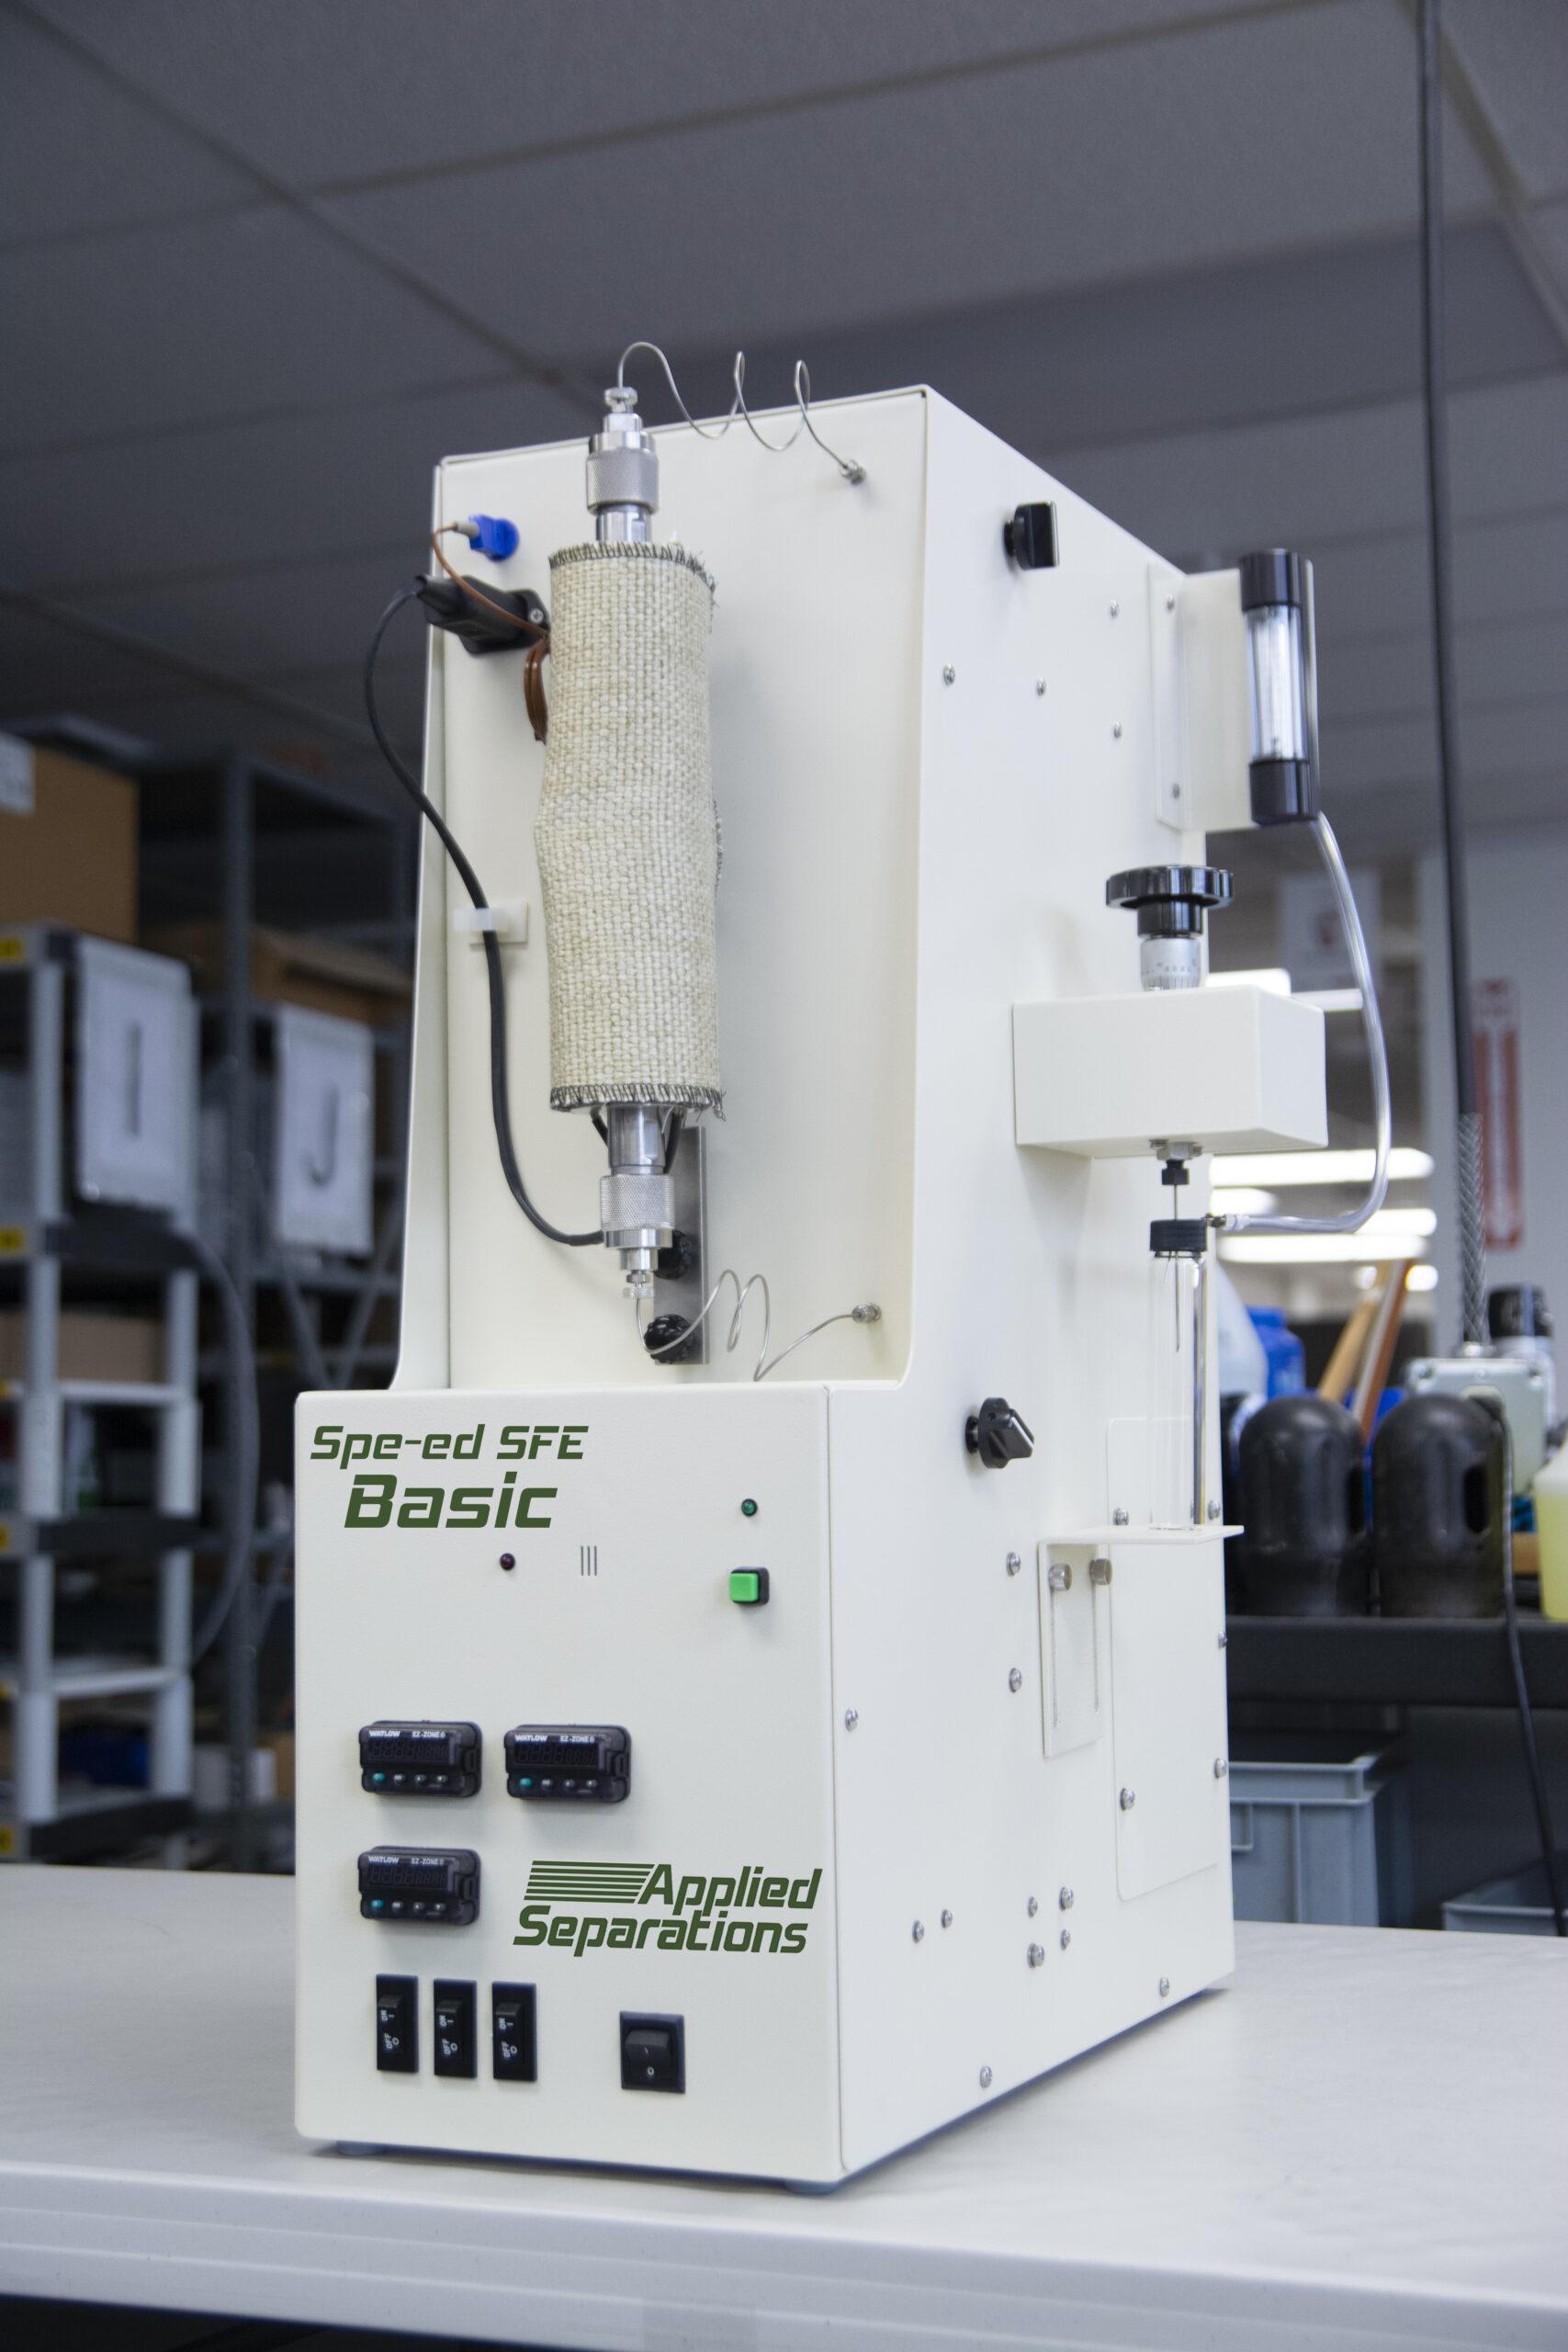 Spe-ed SFE Basic Supercritical Fluid System